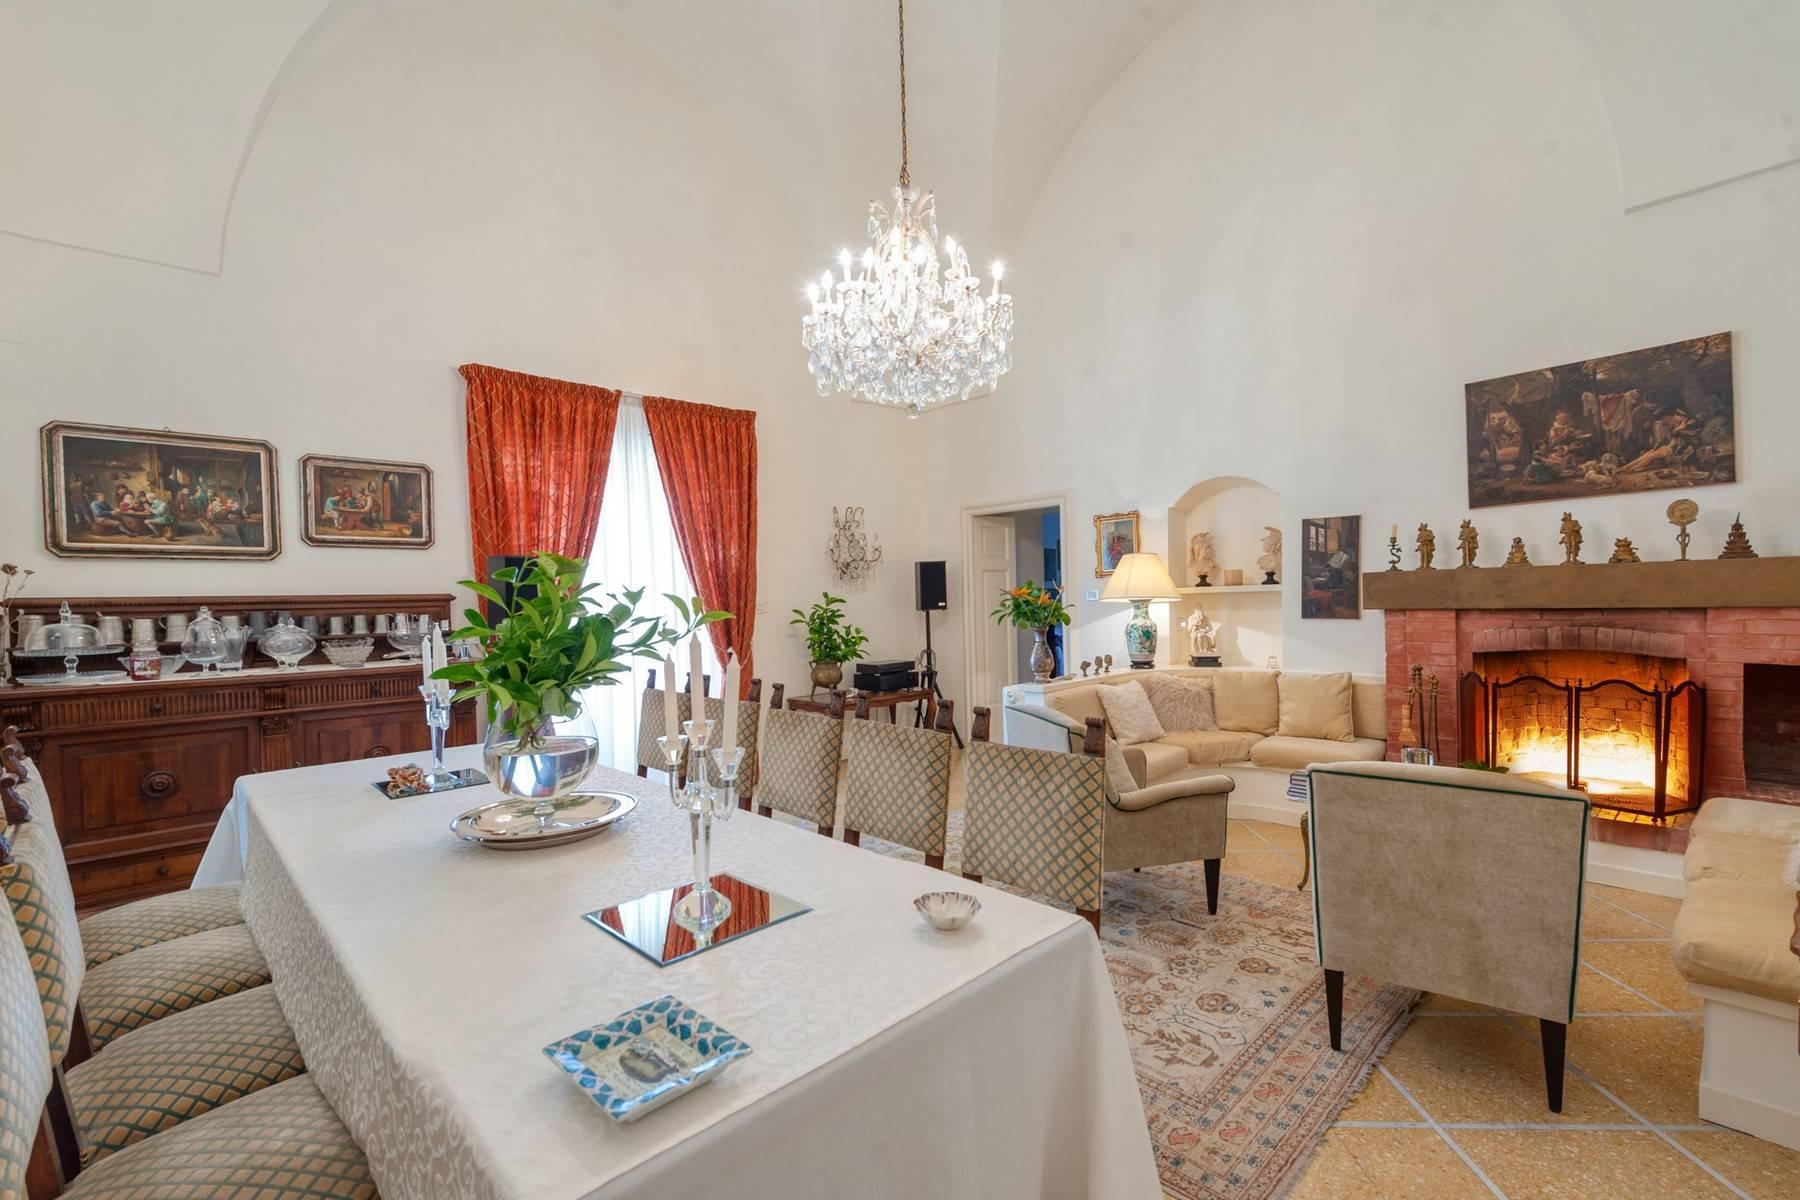 Splendida villa gentilizia del '600 circondata da agrumeti - 10